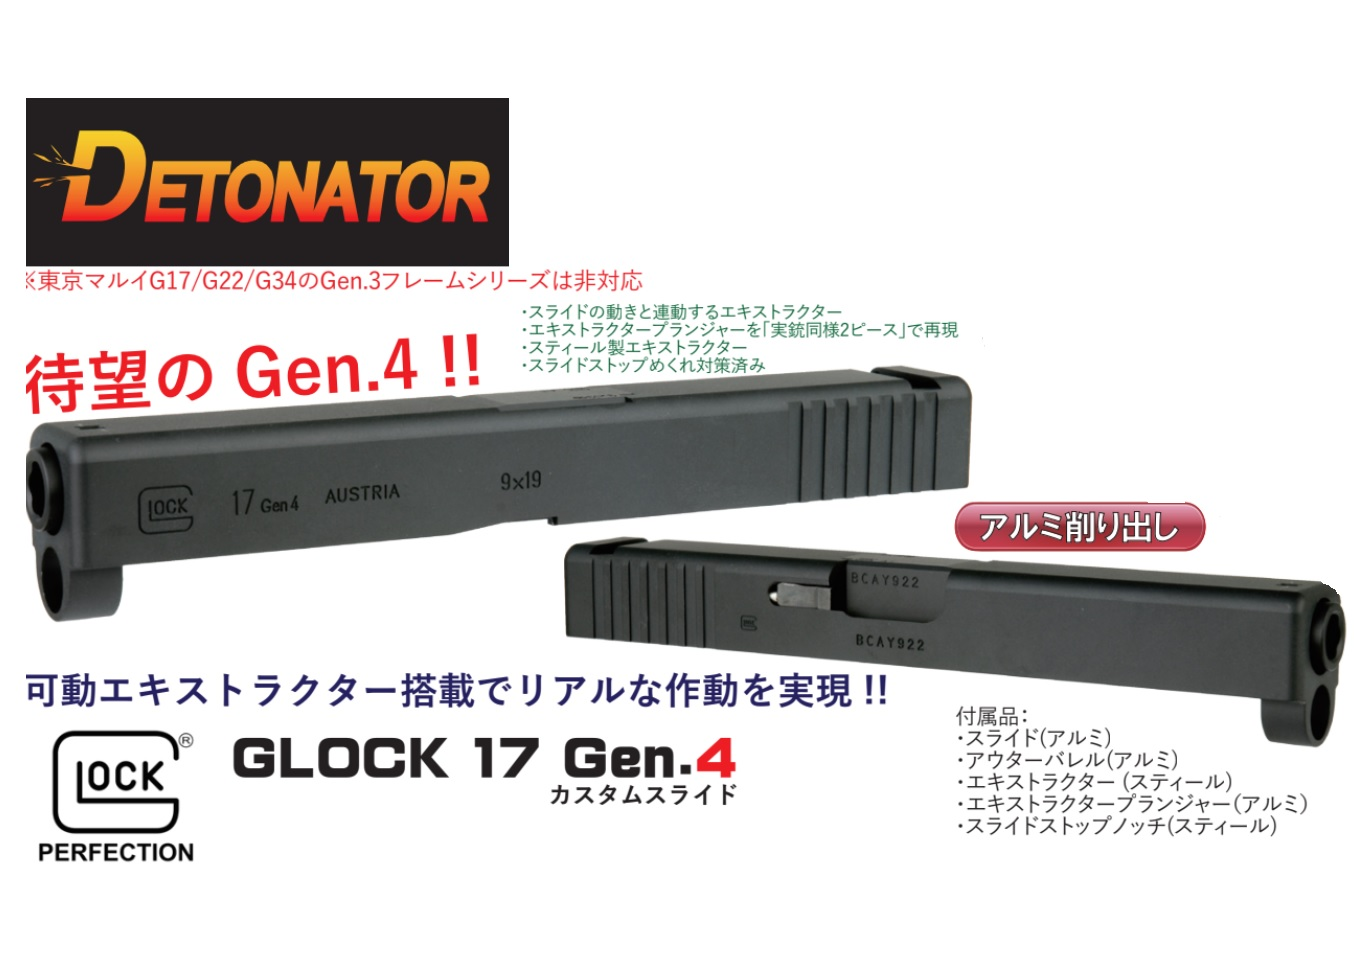 Detonator マルイG17 Gen.4用Glock 17 Gen.4 スライドセット -BK